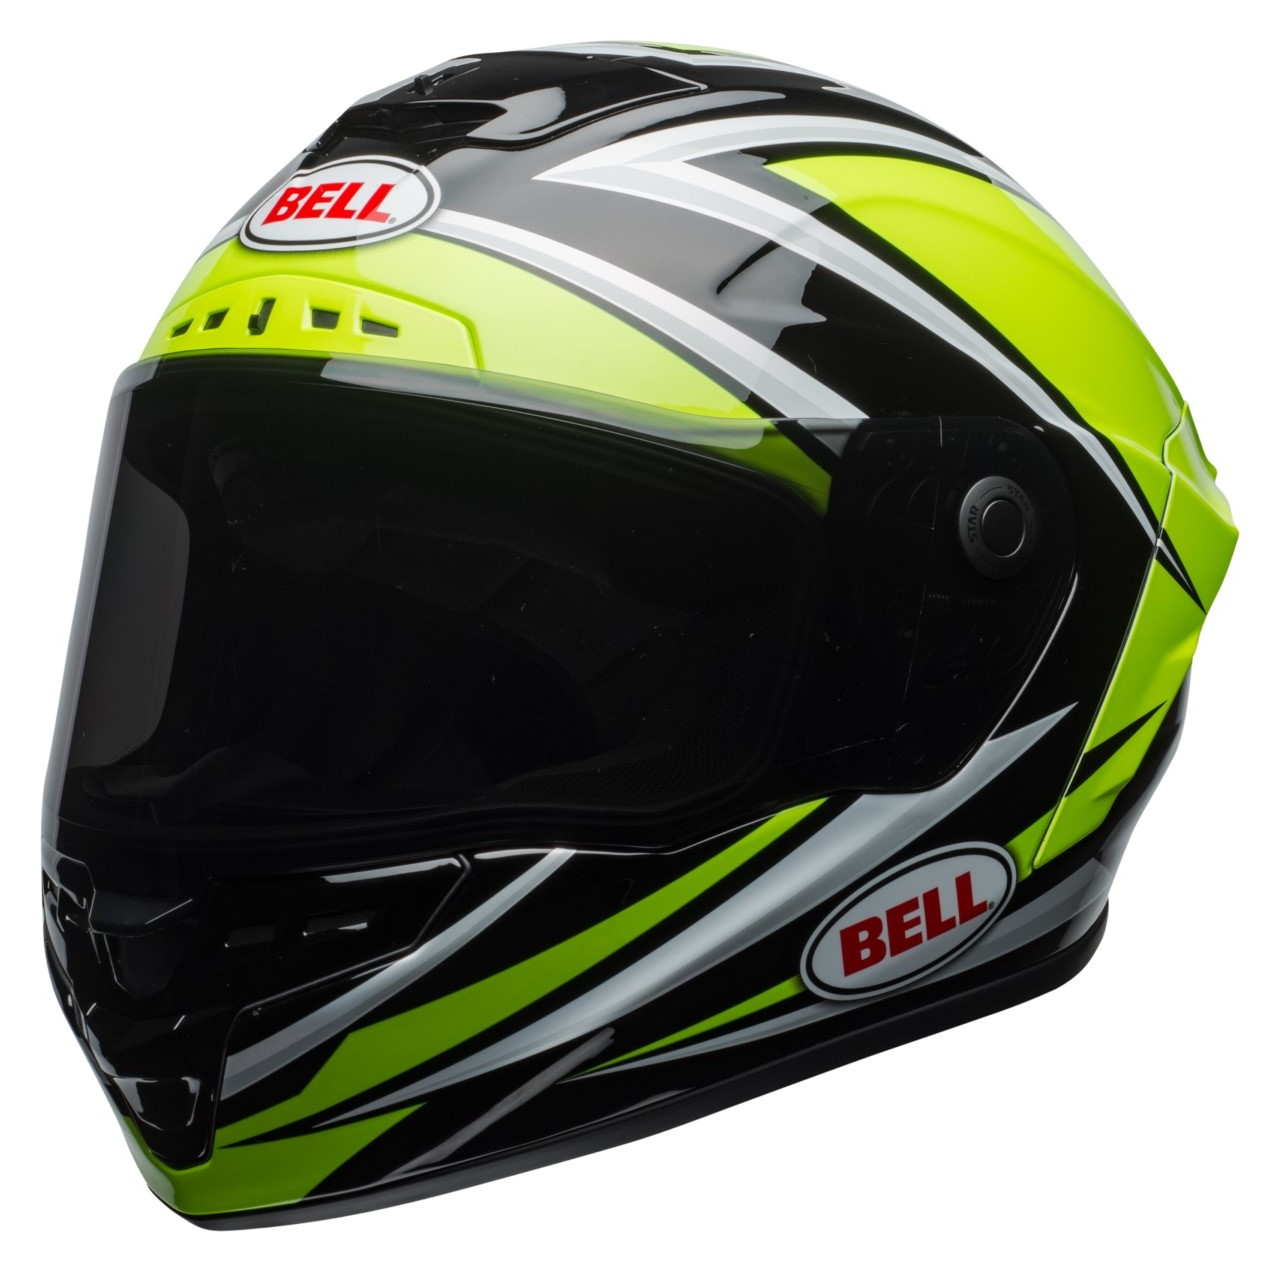 bell_star_mips_torsion_helmet.jpg